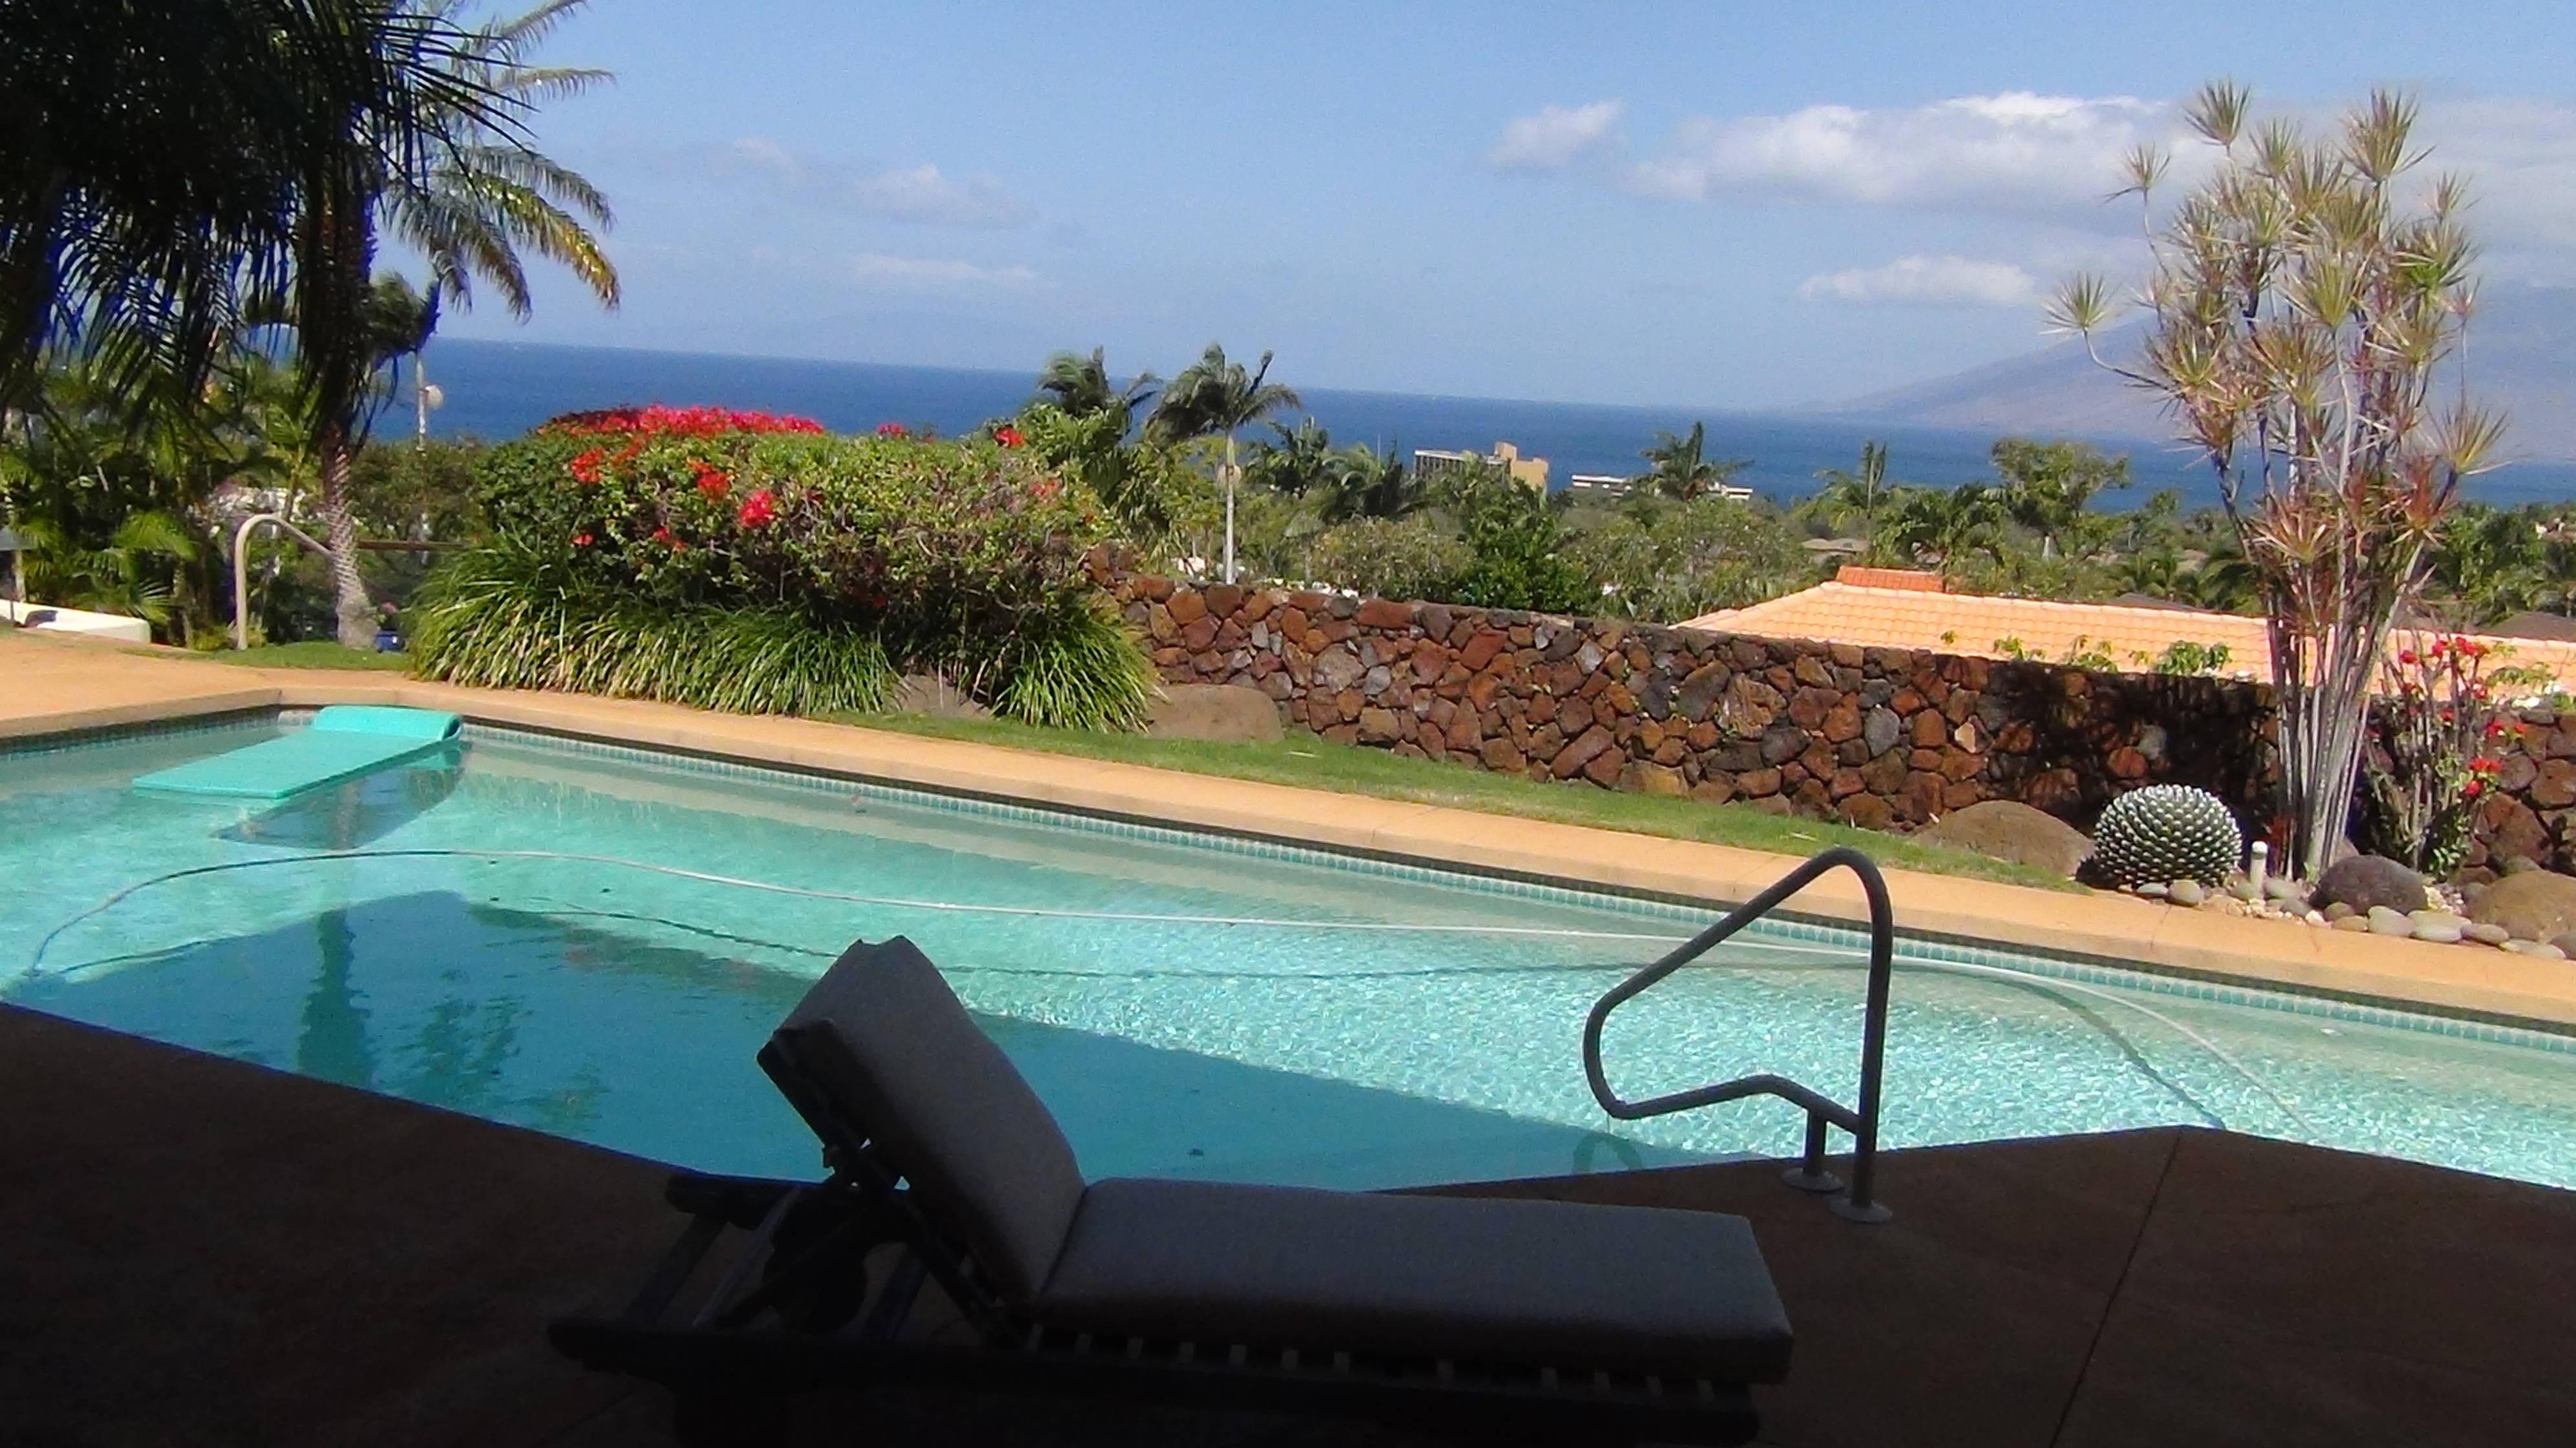 luxury homes wailea maui for sale wailea real estate. Black Bedroom Furniture Sets. Home Design Ideas